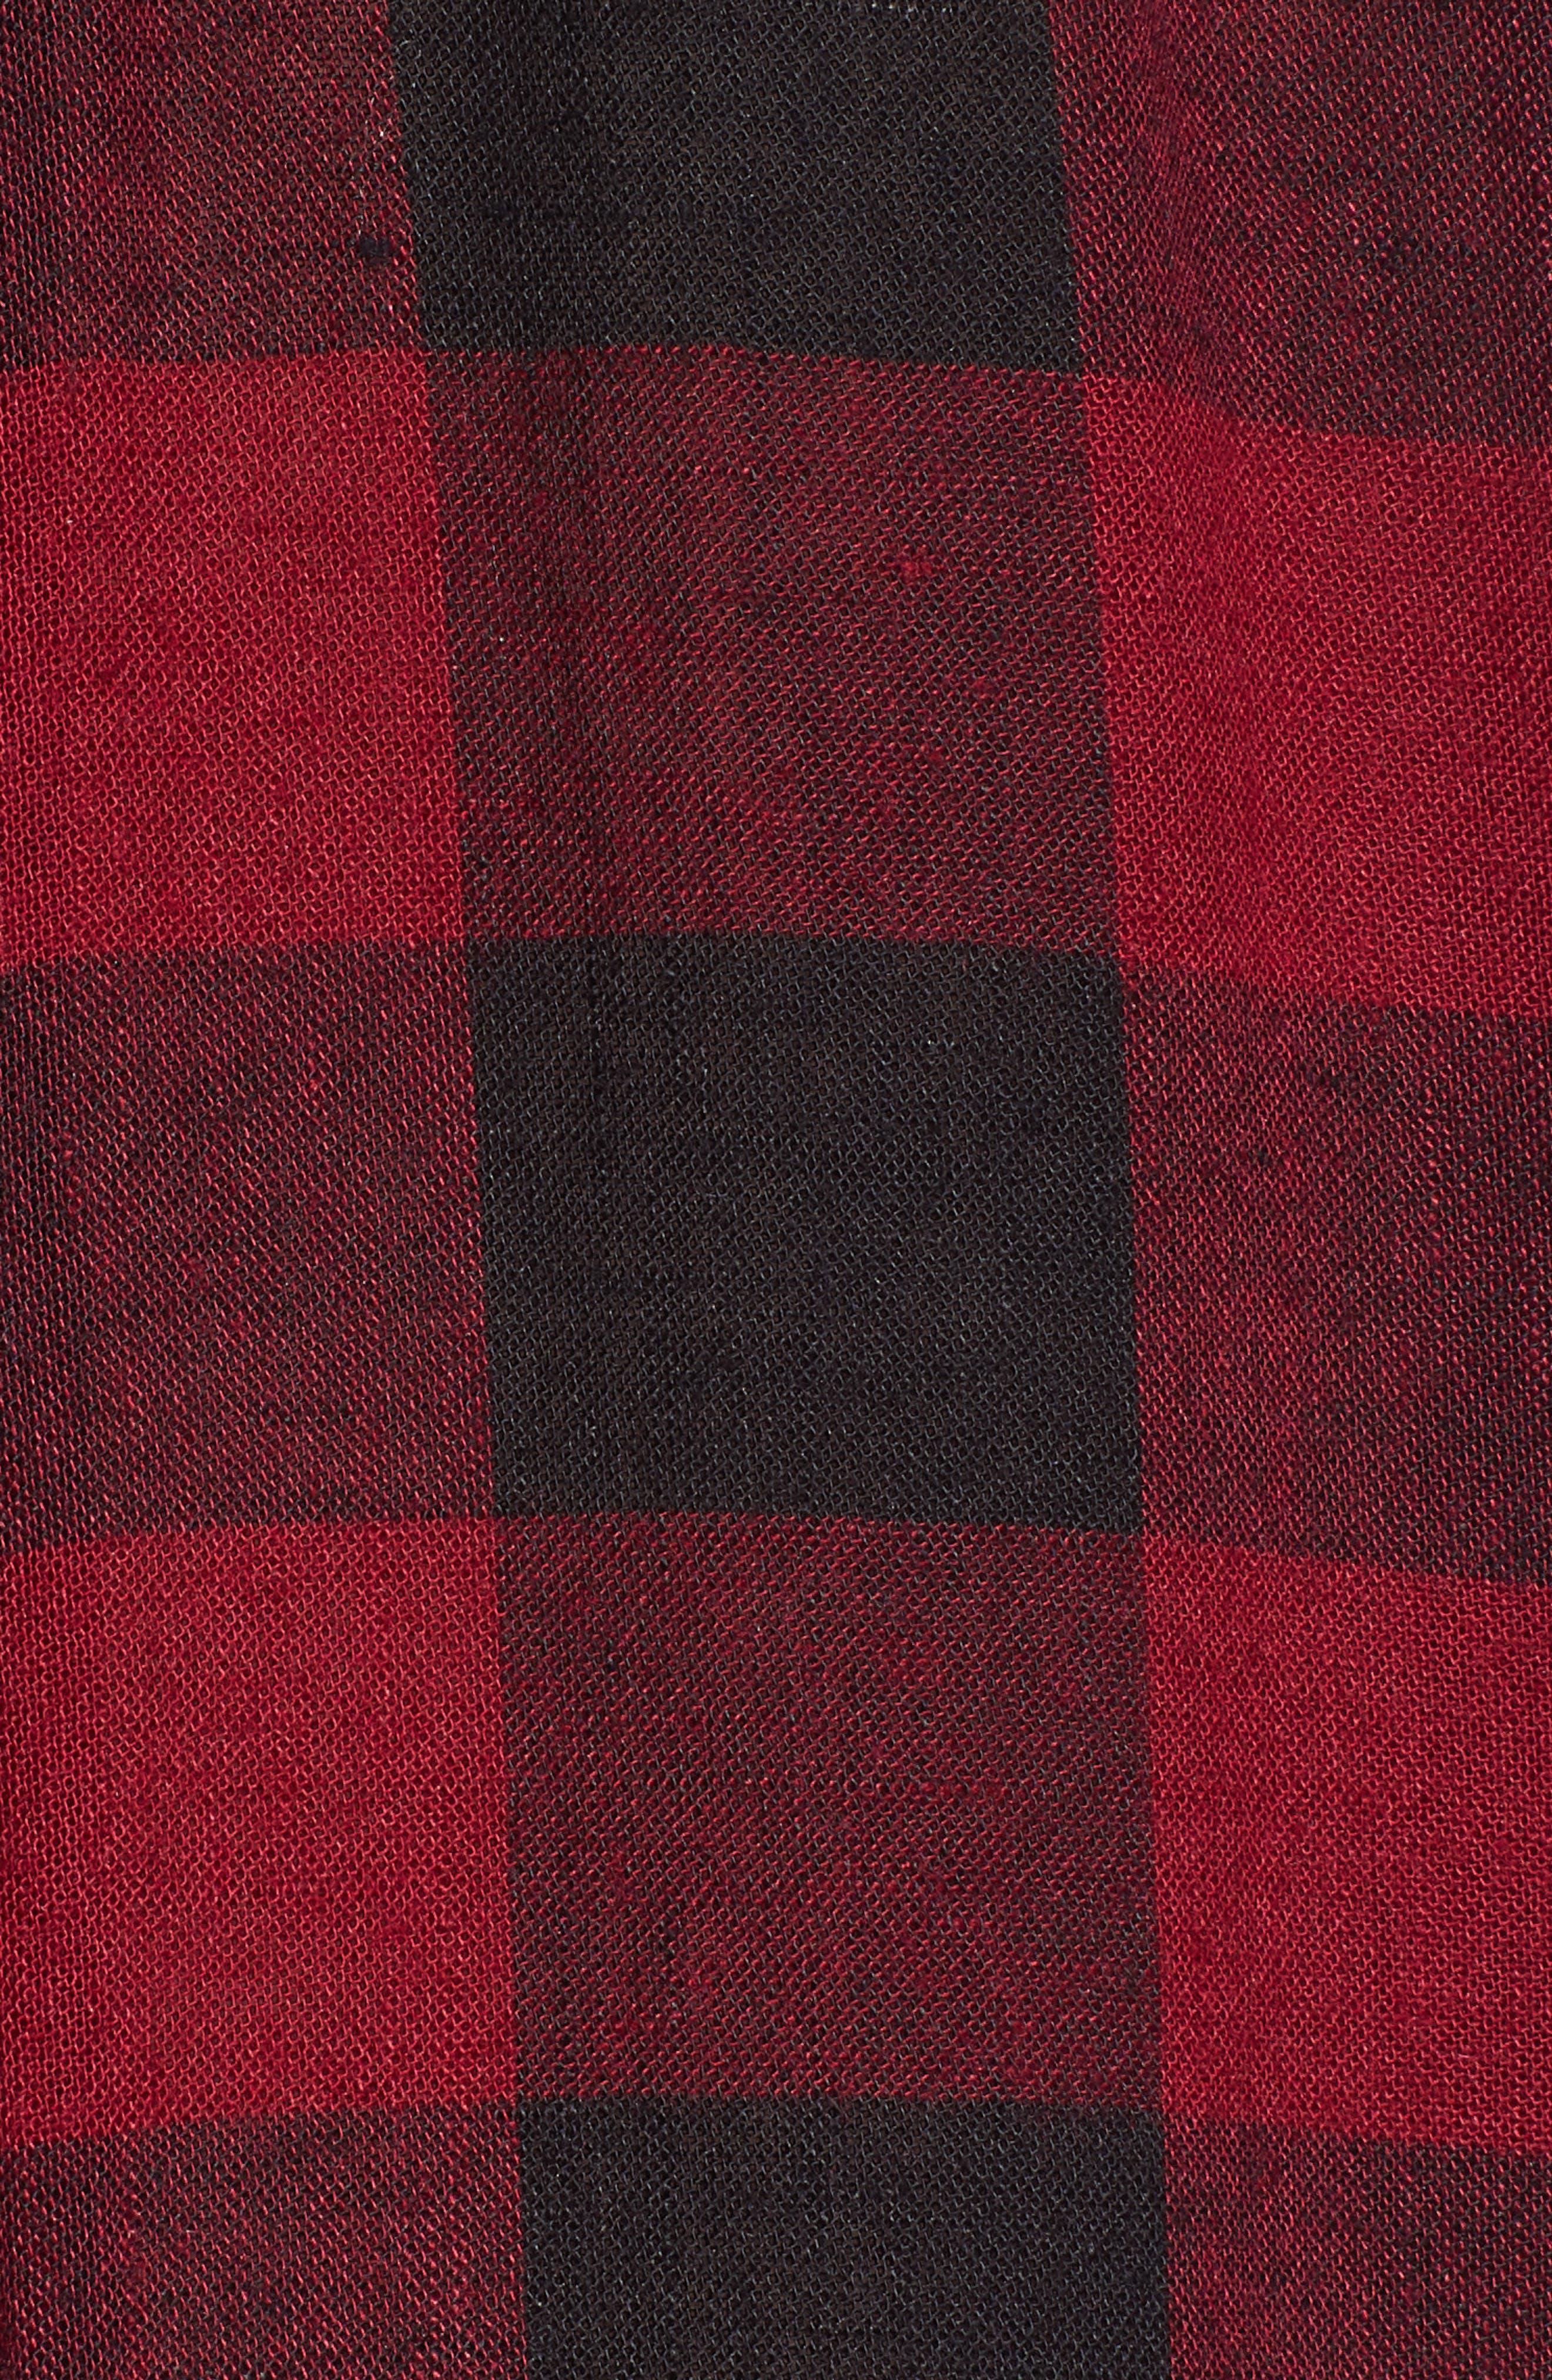 Redding Plaid Shirt,                             Alternate thumbnail 5, color,                             SANGUINE BLACK